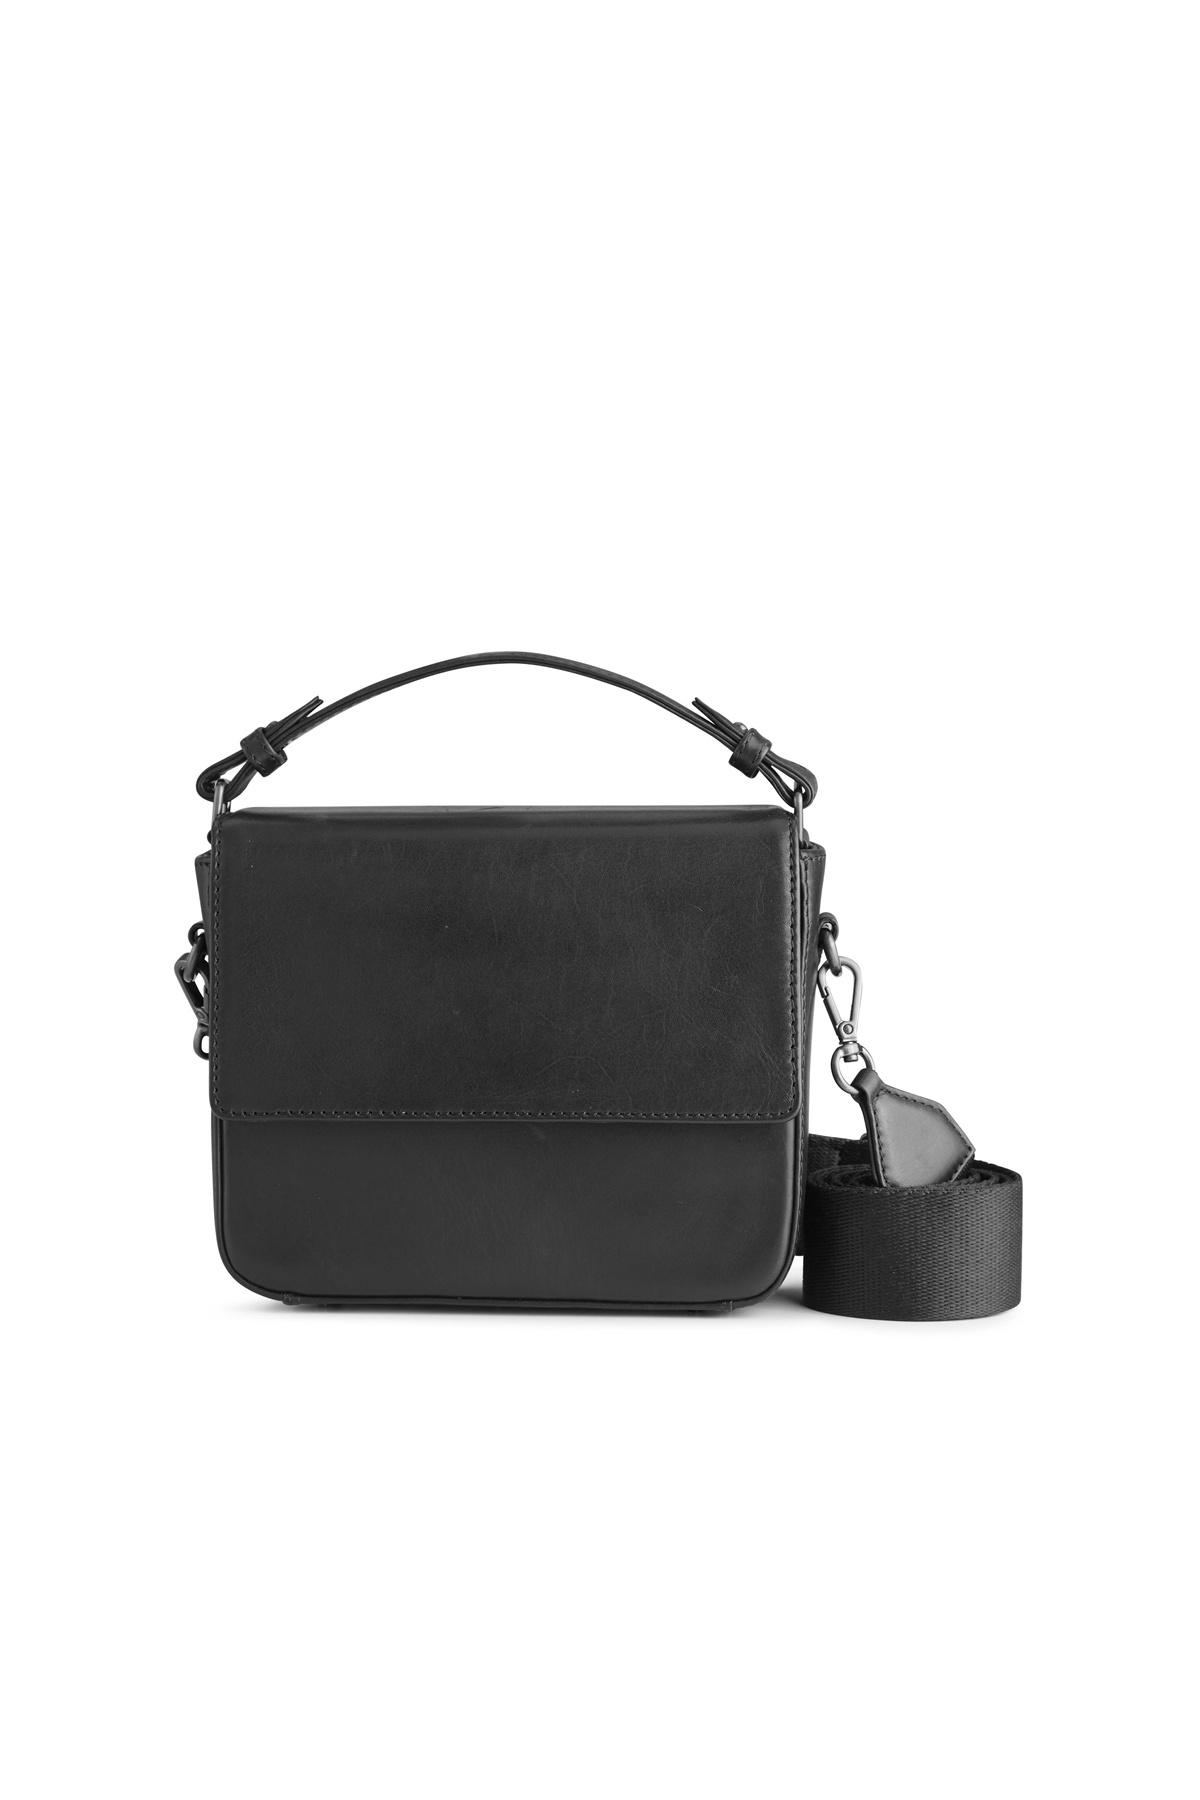 Adora Large Crossbody Bag - Antique Black w/ Black-1